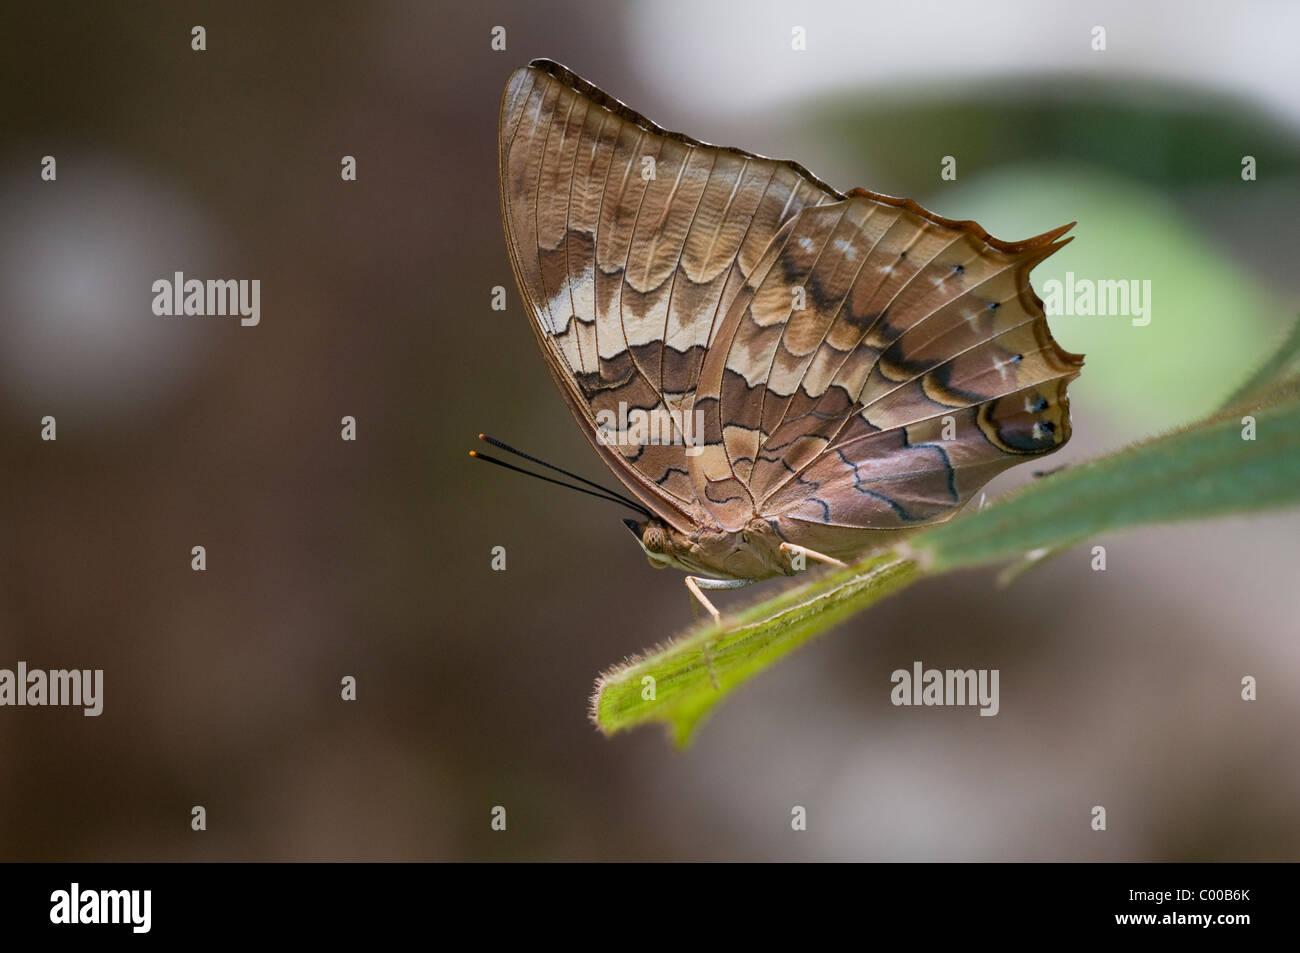 Tropischer Schmetterling, Tropical Butterfly, Tanjung Puting Nationalpark, Indonesien, Indonesia - Stock Image